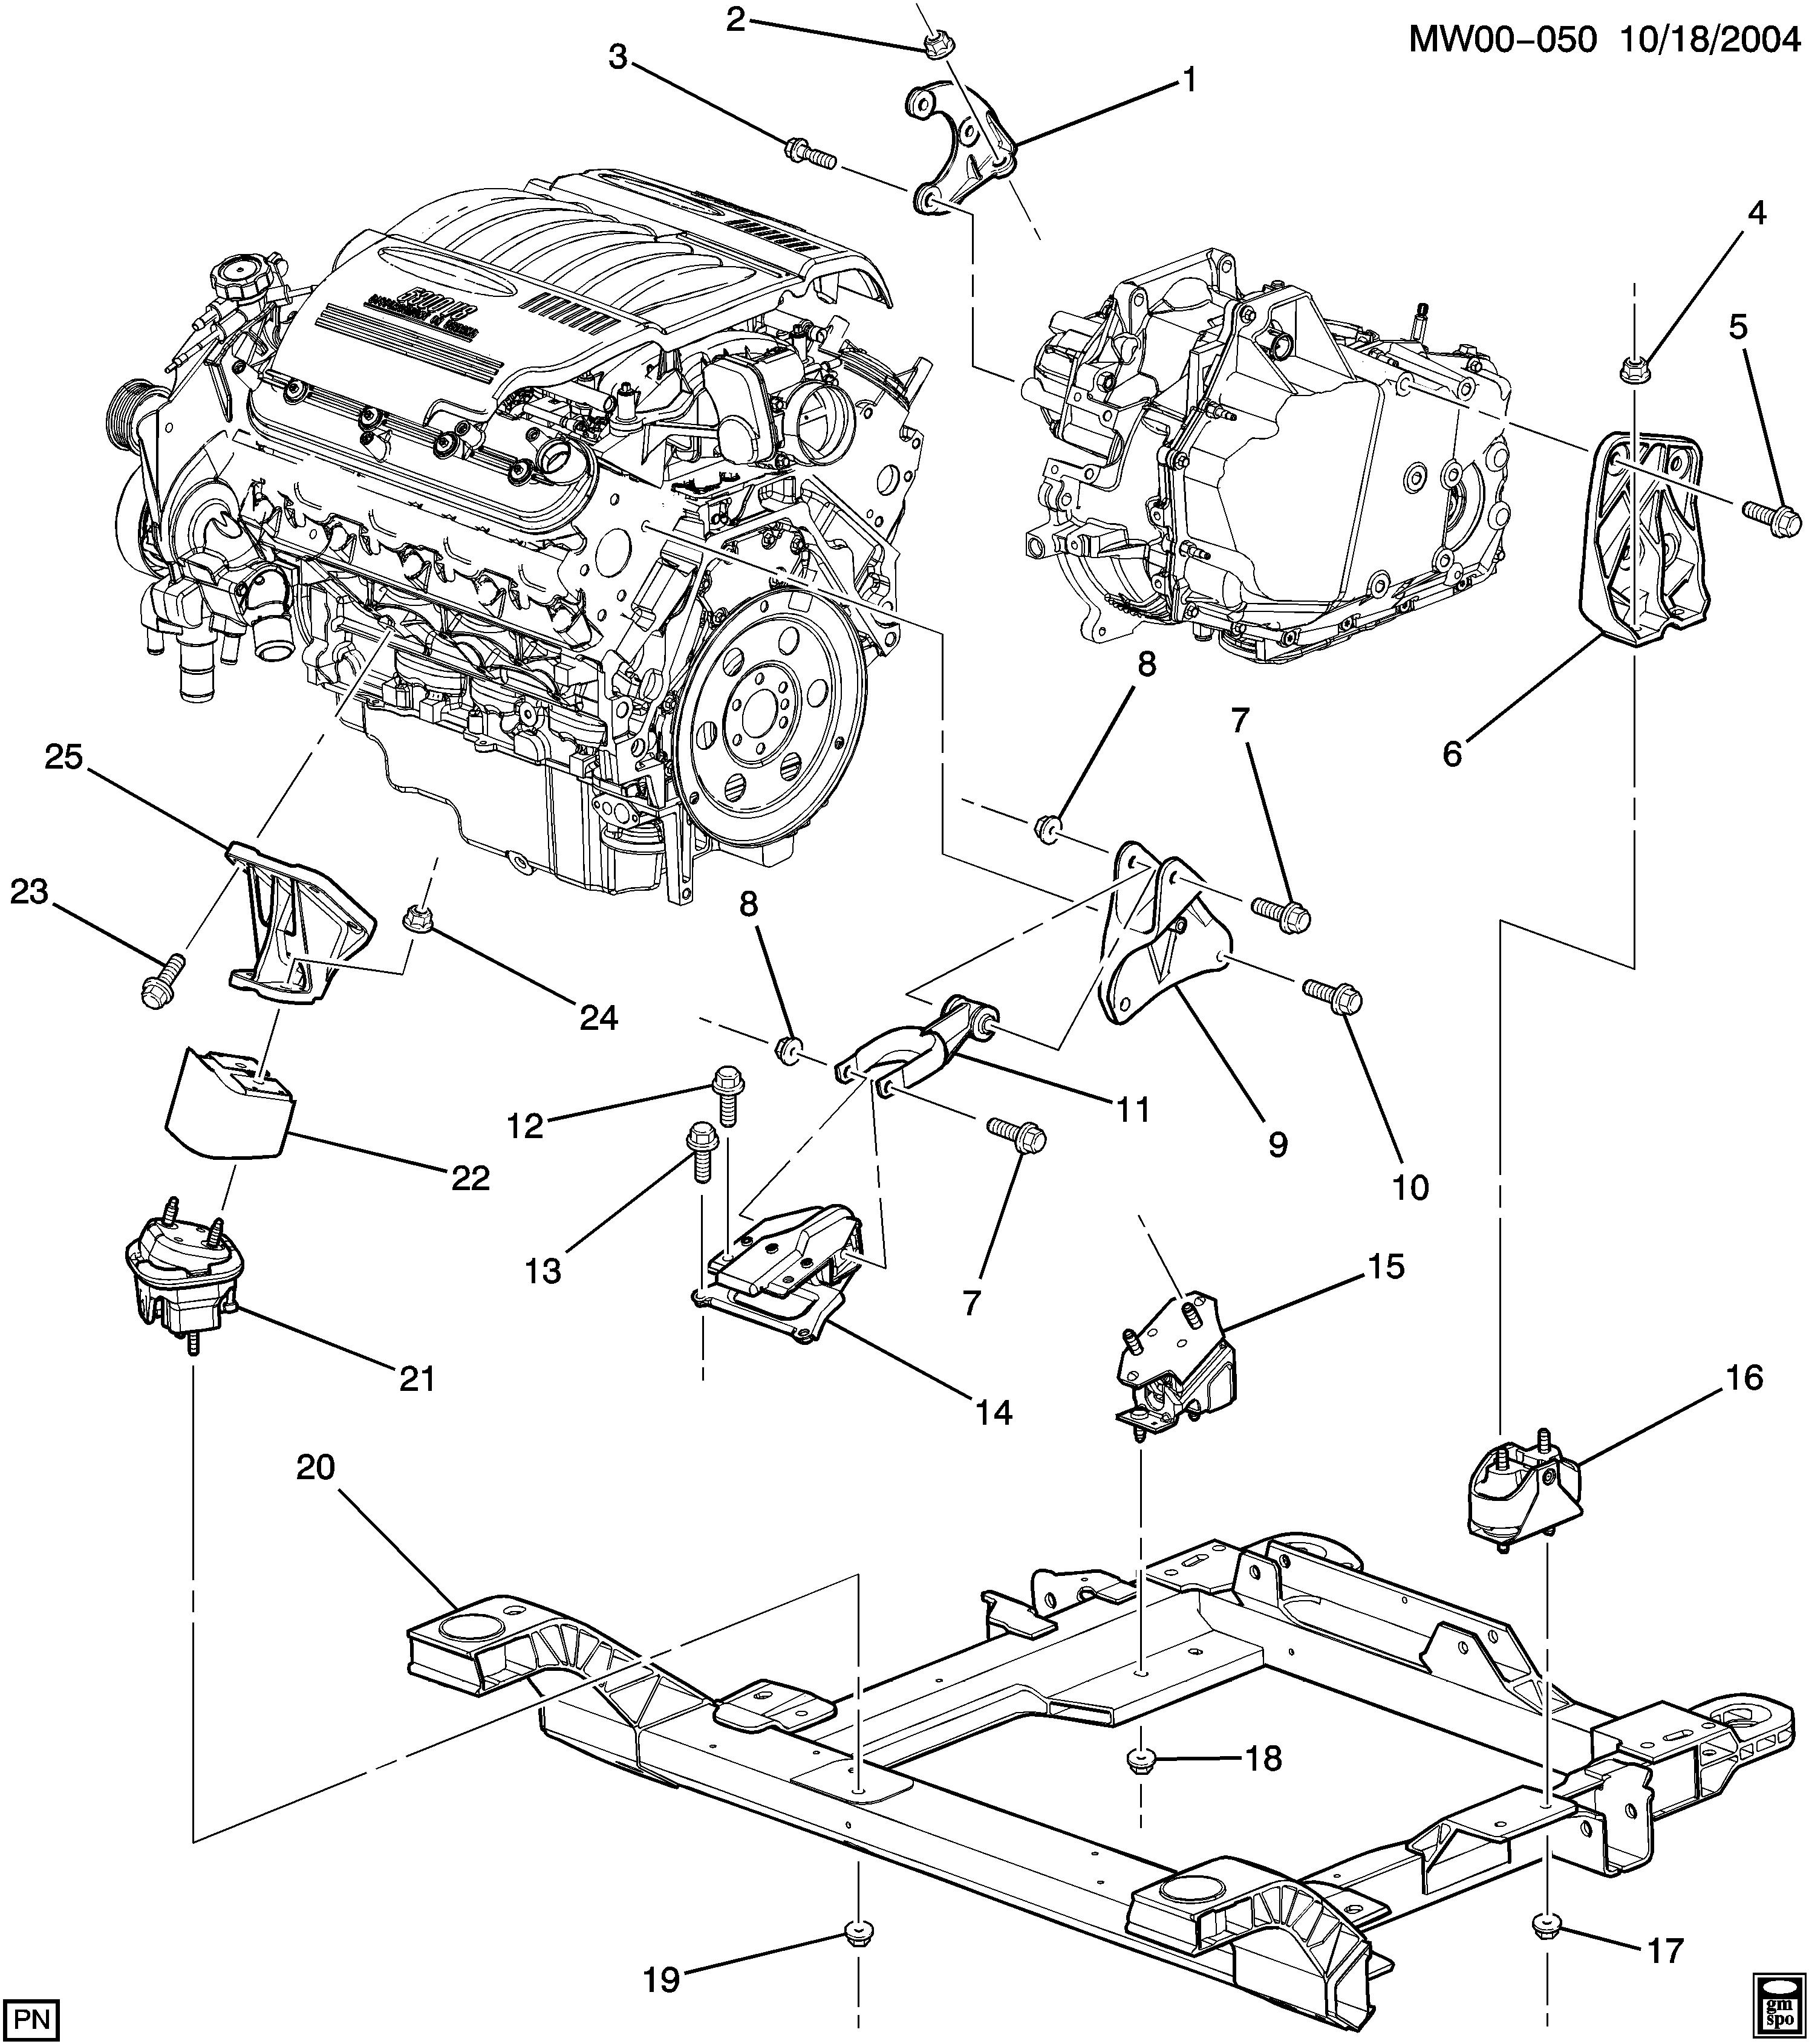 Buick Lacrosse/Allure / Spare parts catalog EPC